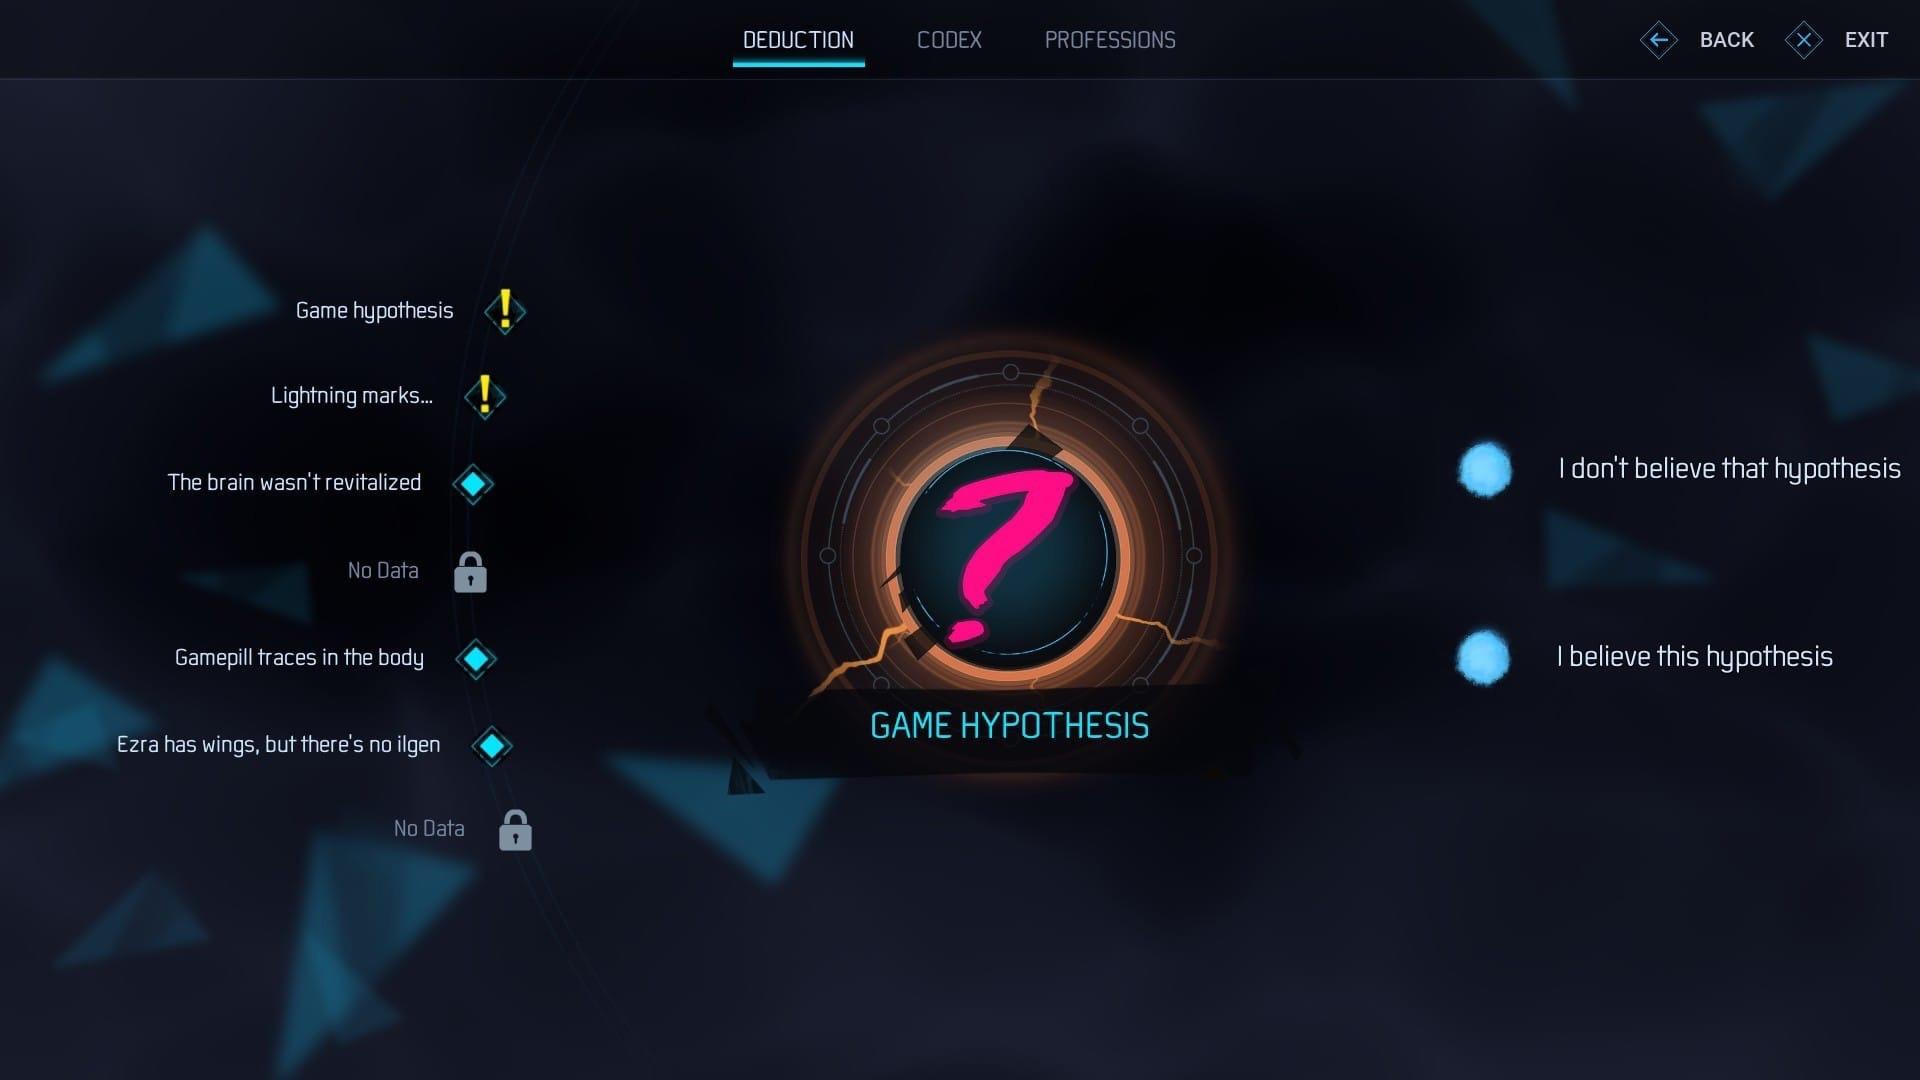 HXvfLpeQ9eA game art logo